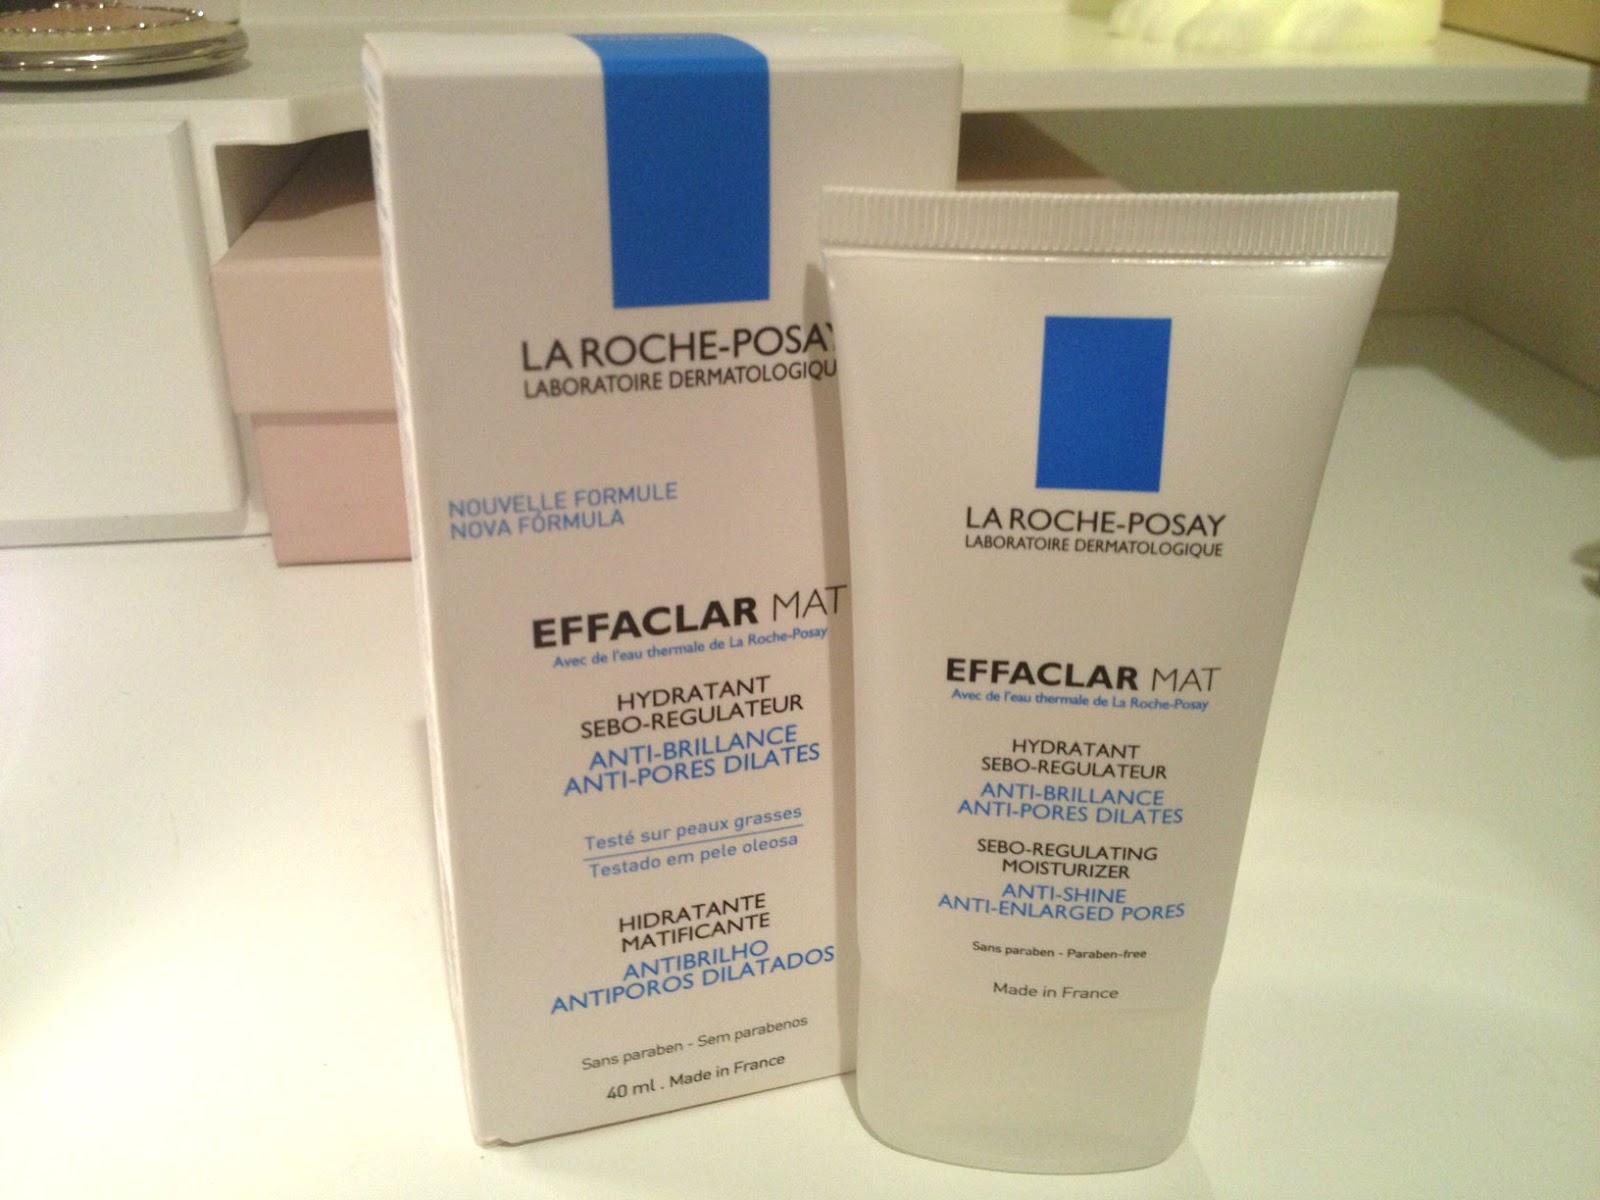 swapidu sunscreen mats moisturizers carmenesque swap mat posay effaclar product roche without beauty for la